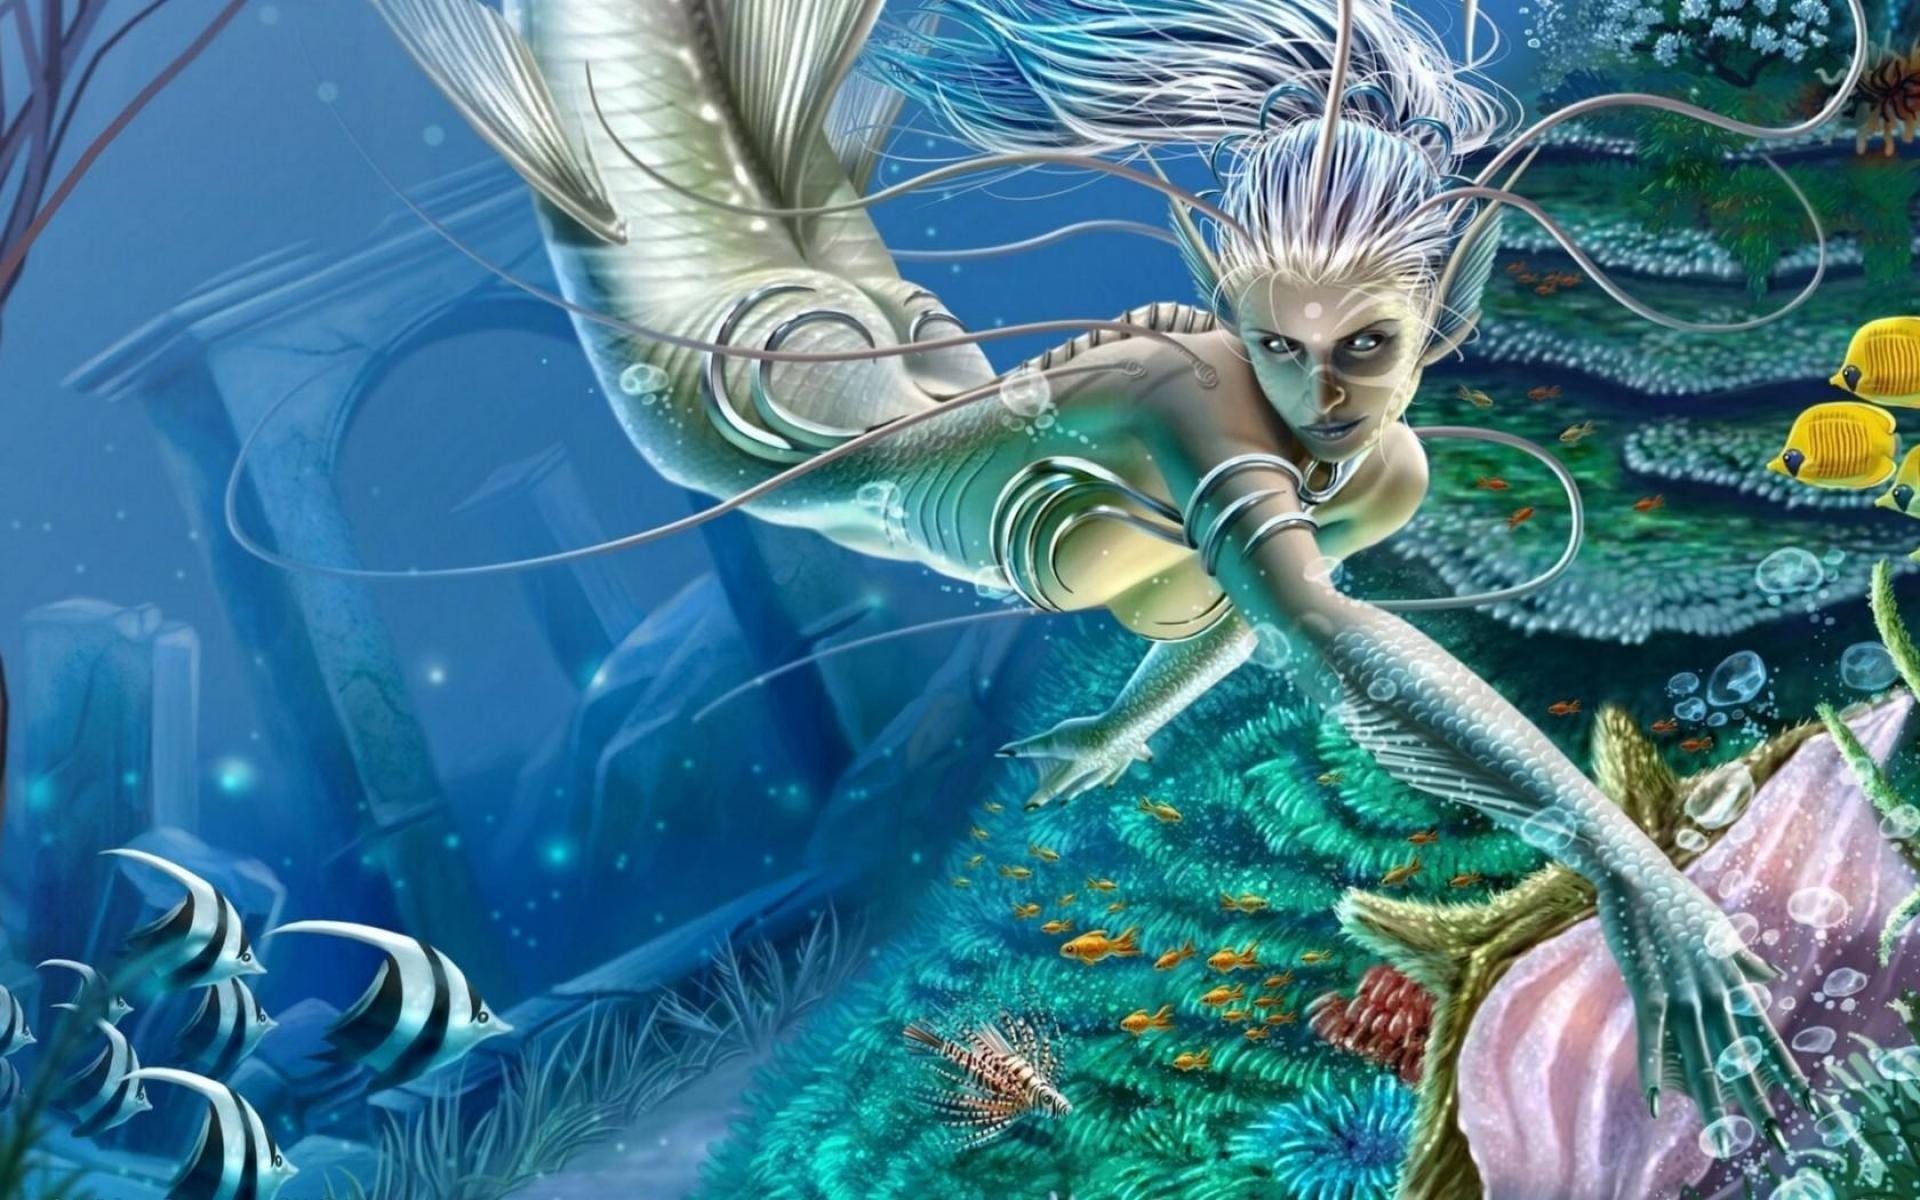 Mermaid Desktop Backgrounds – Wallpaper, High Definition, High Quality .